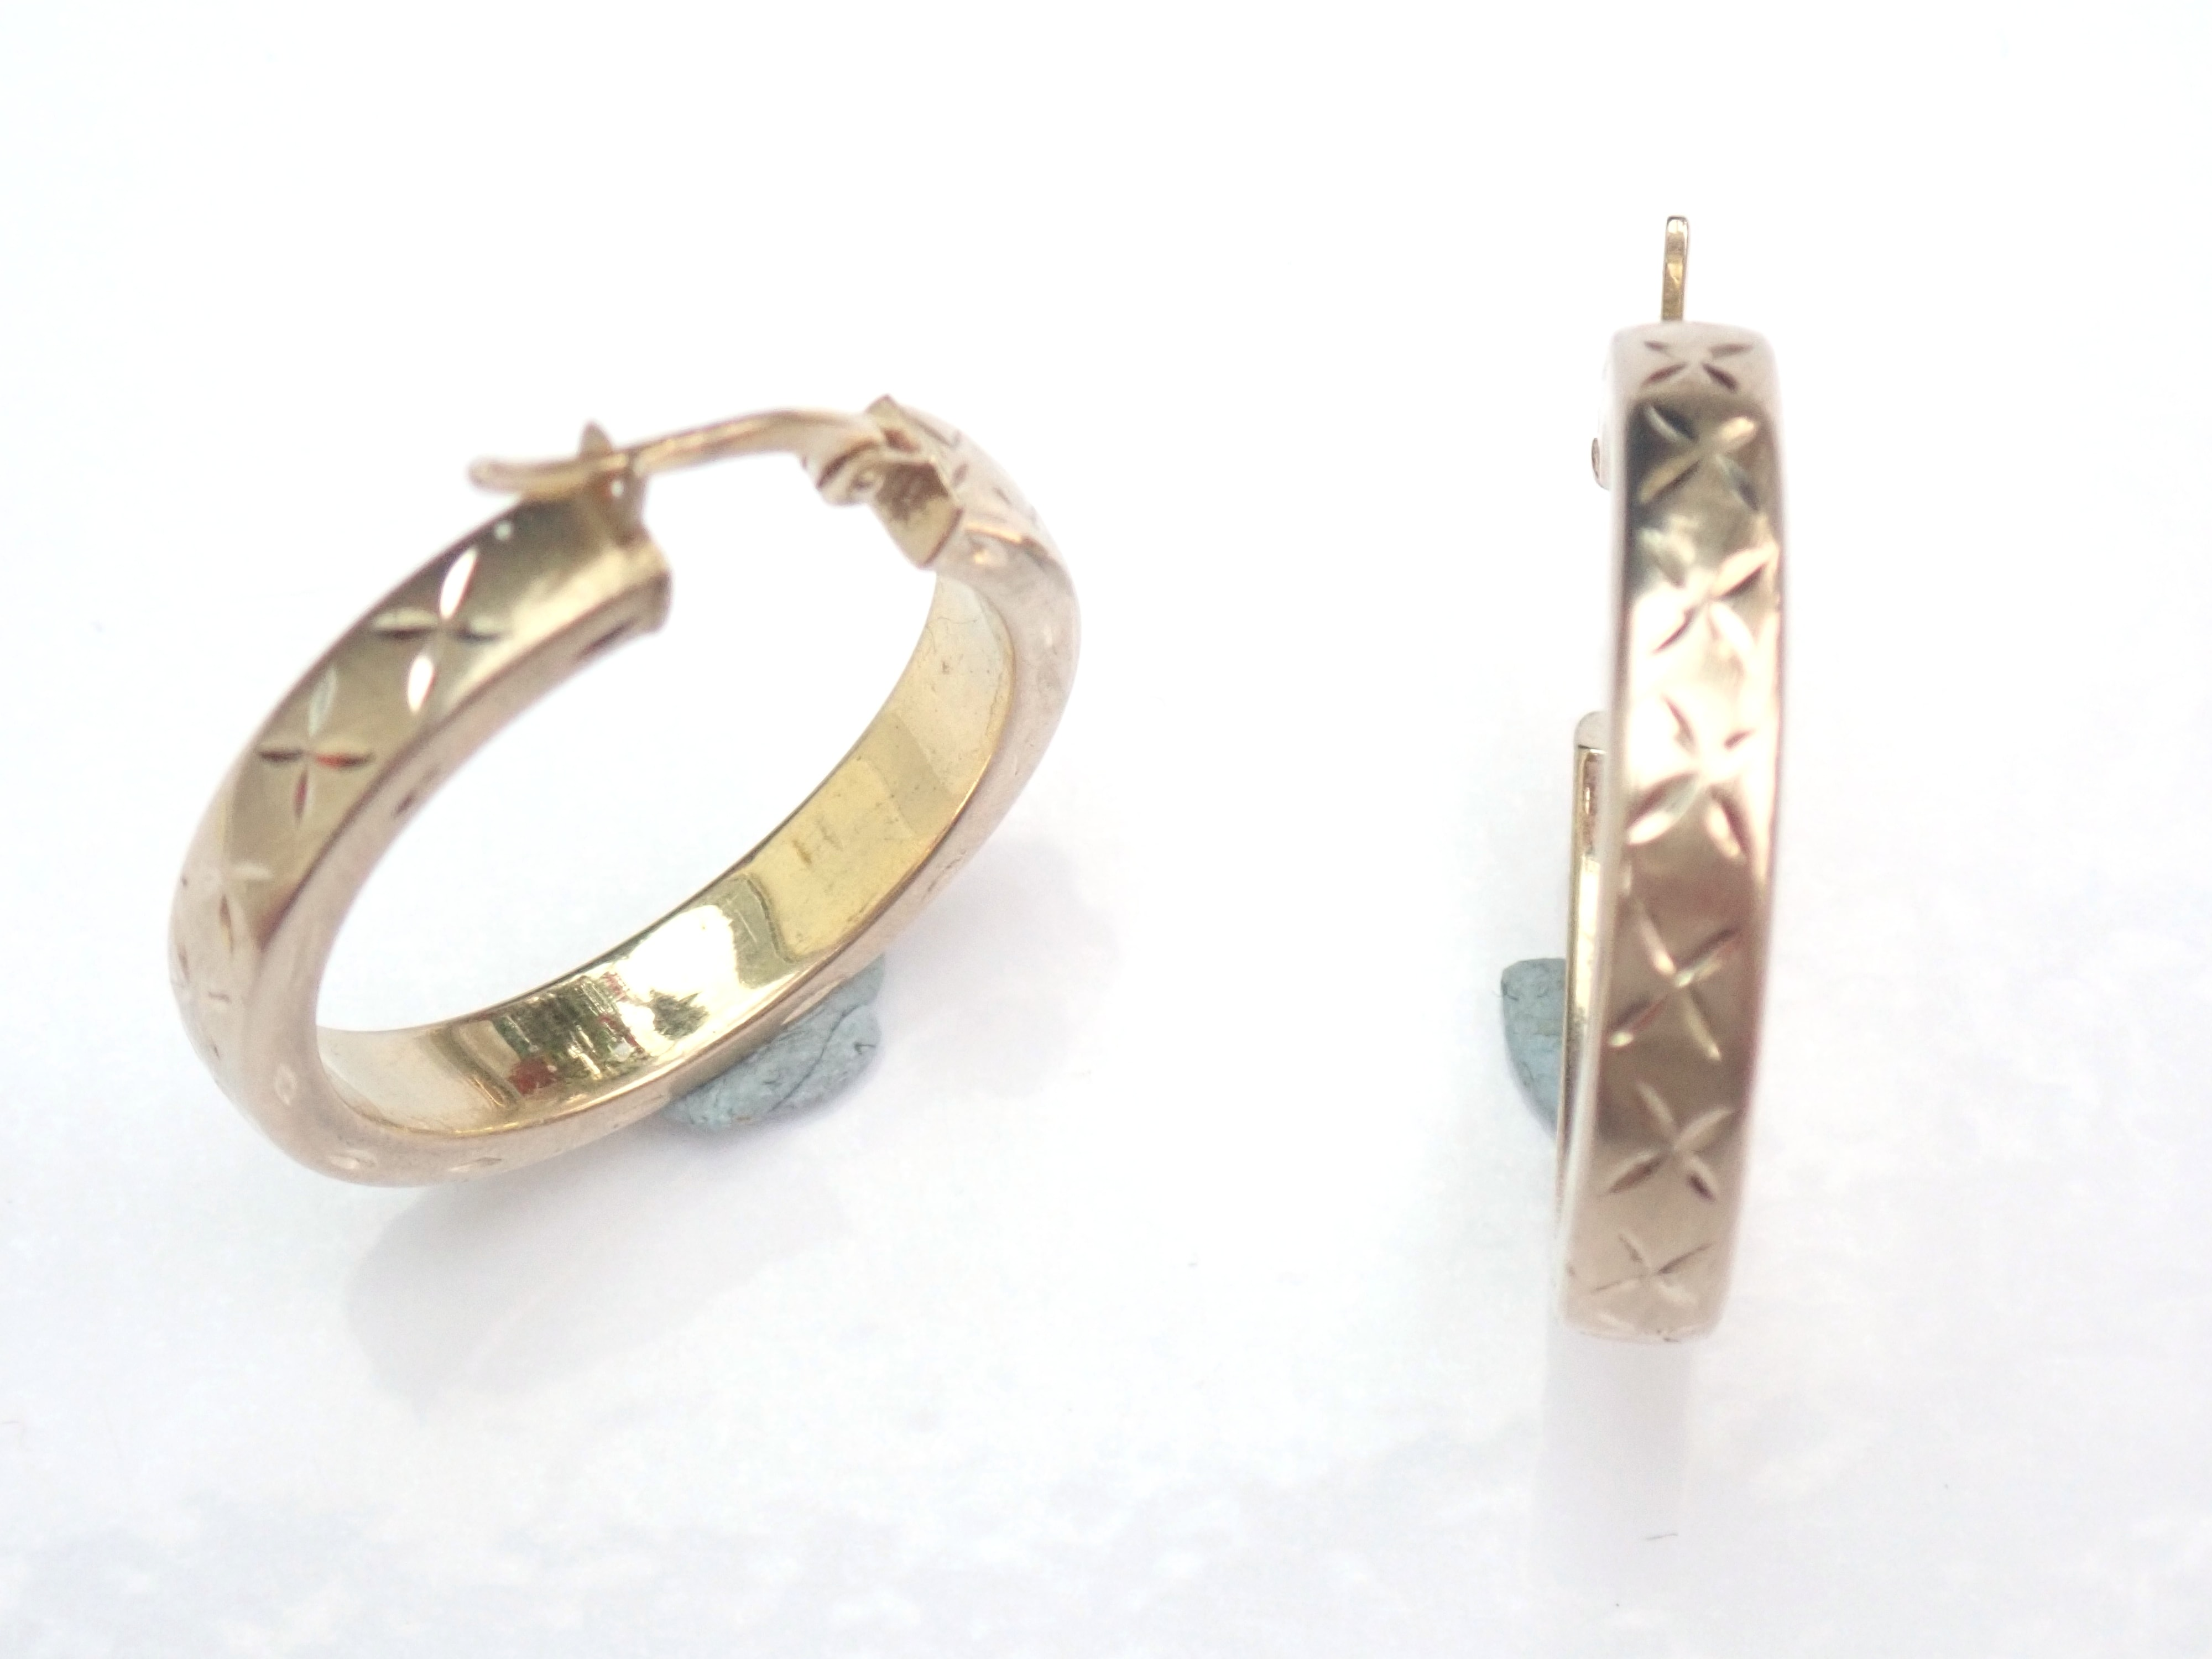 14k 585 Gold Hooped Earrings Diamond engraved X Pattern 24mm Diameter #100